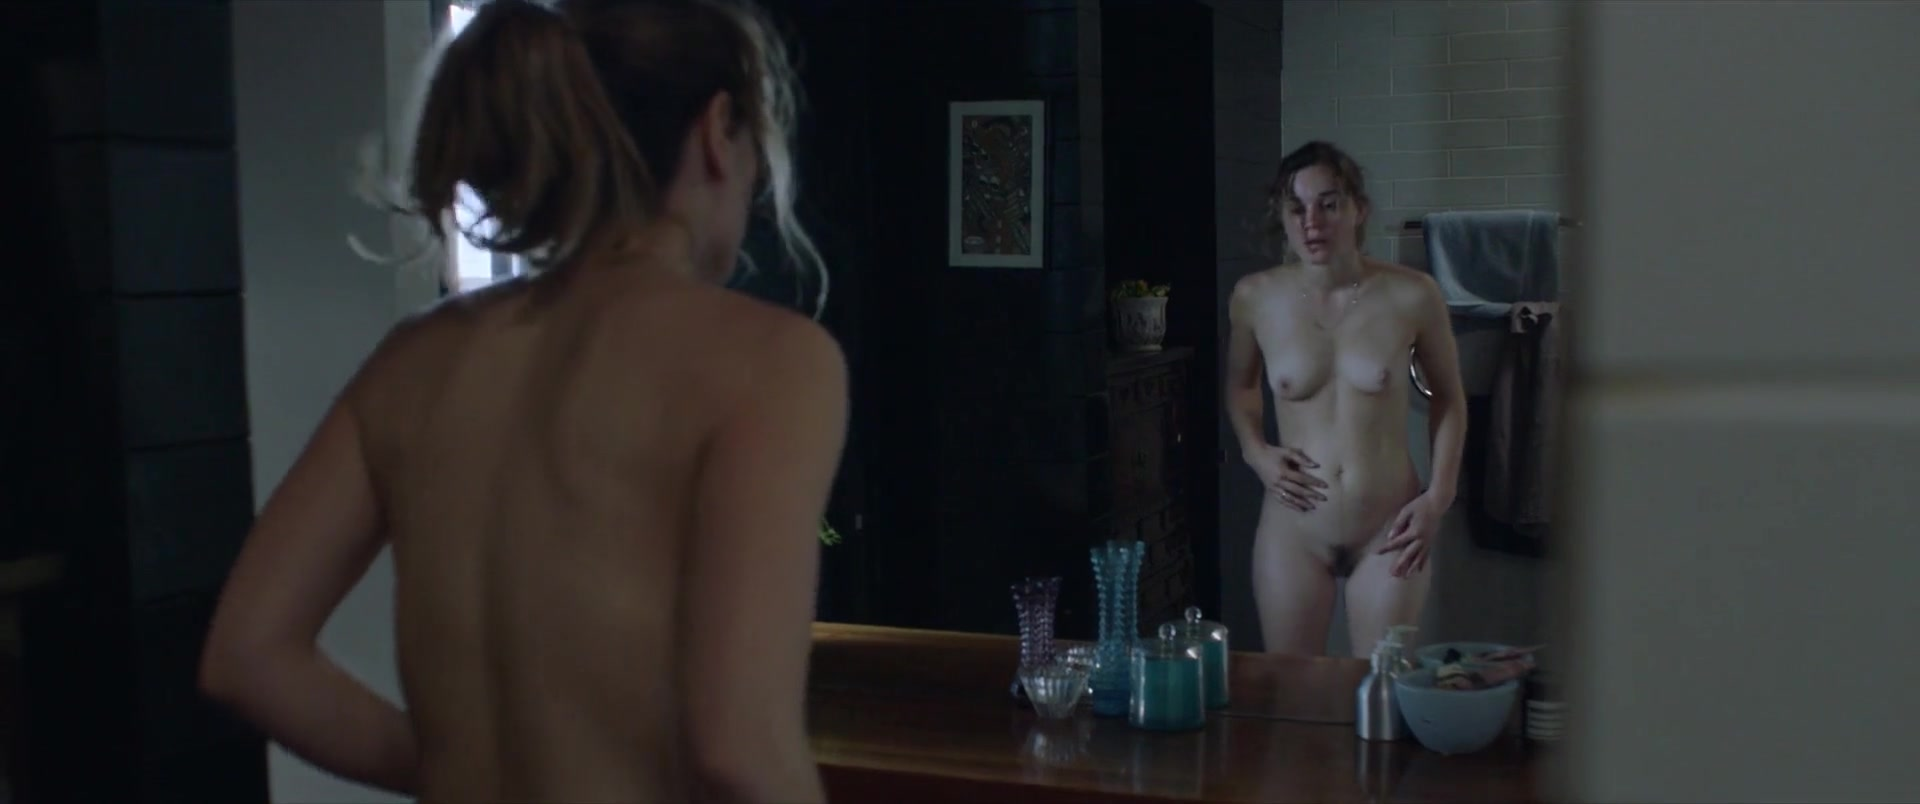 Gordon  nackt Sophie Video: Sophie